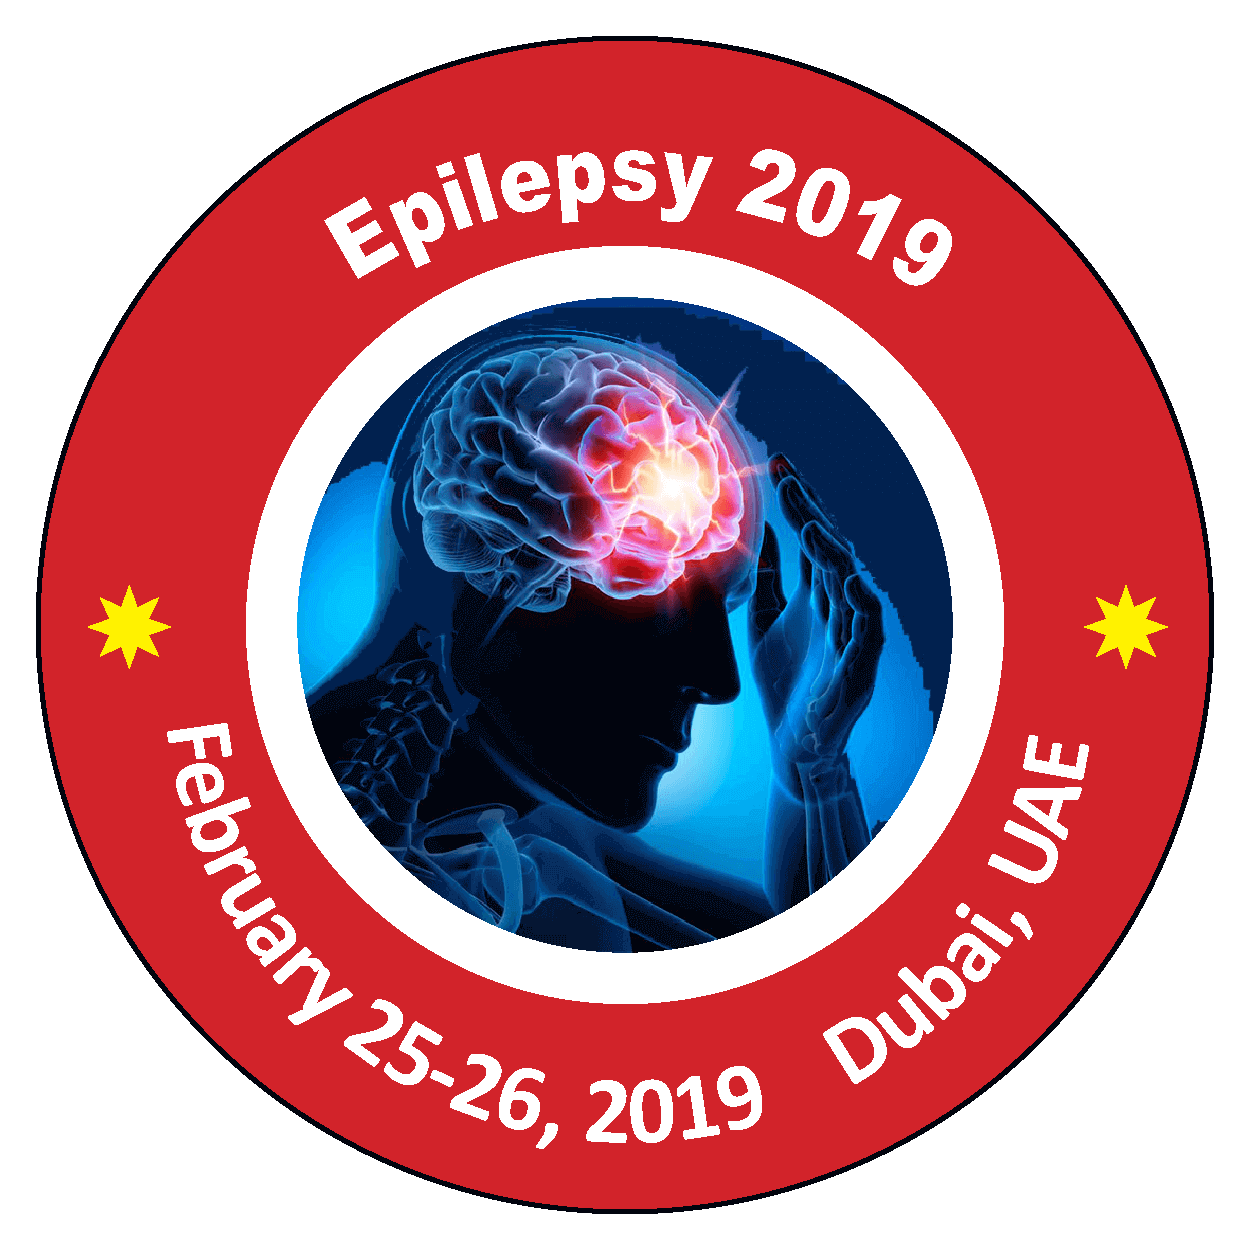 Epilepsy Conferences | Epilepsy 2019 | Neuroscience